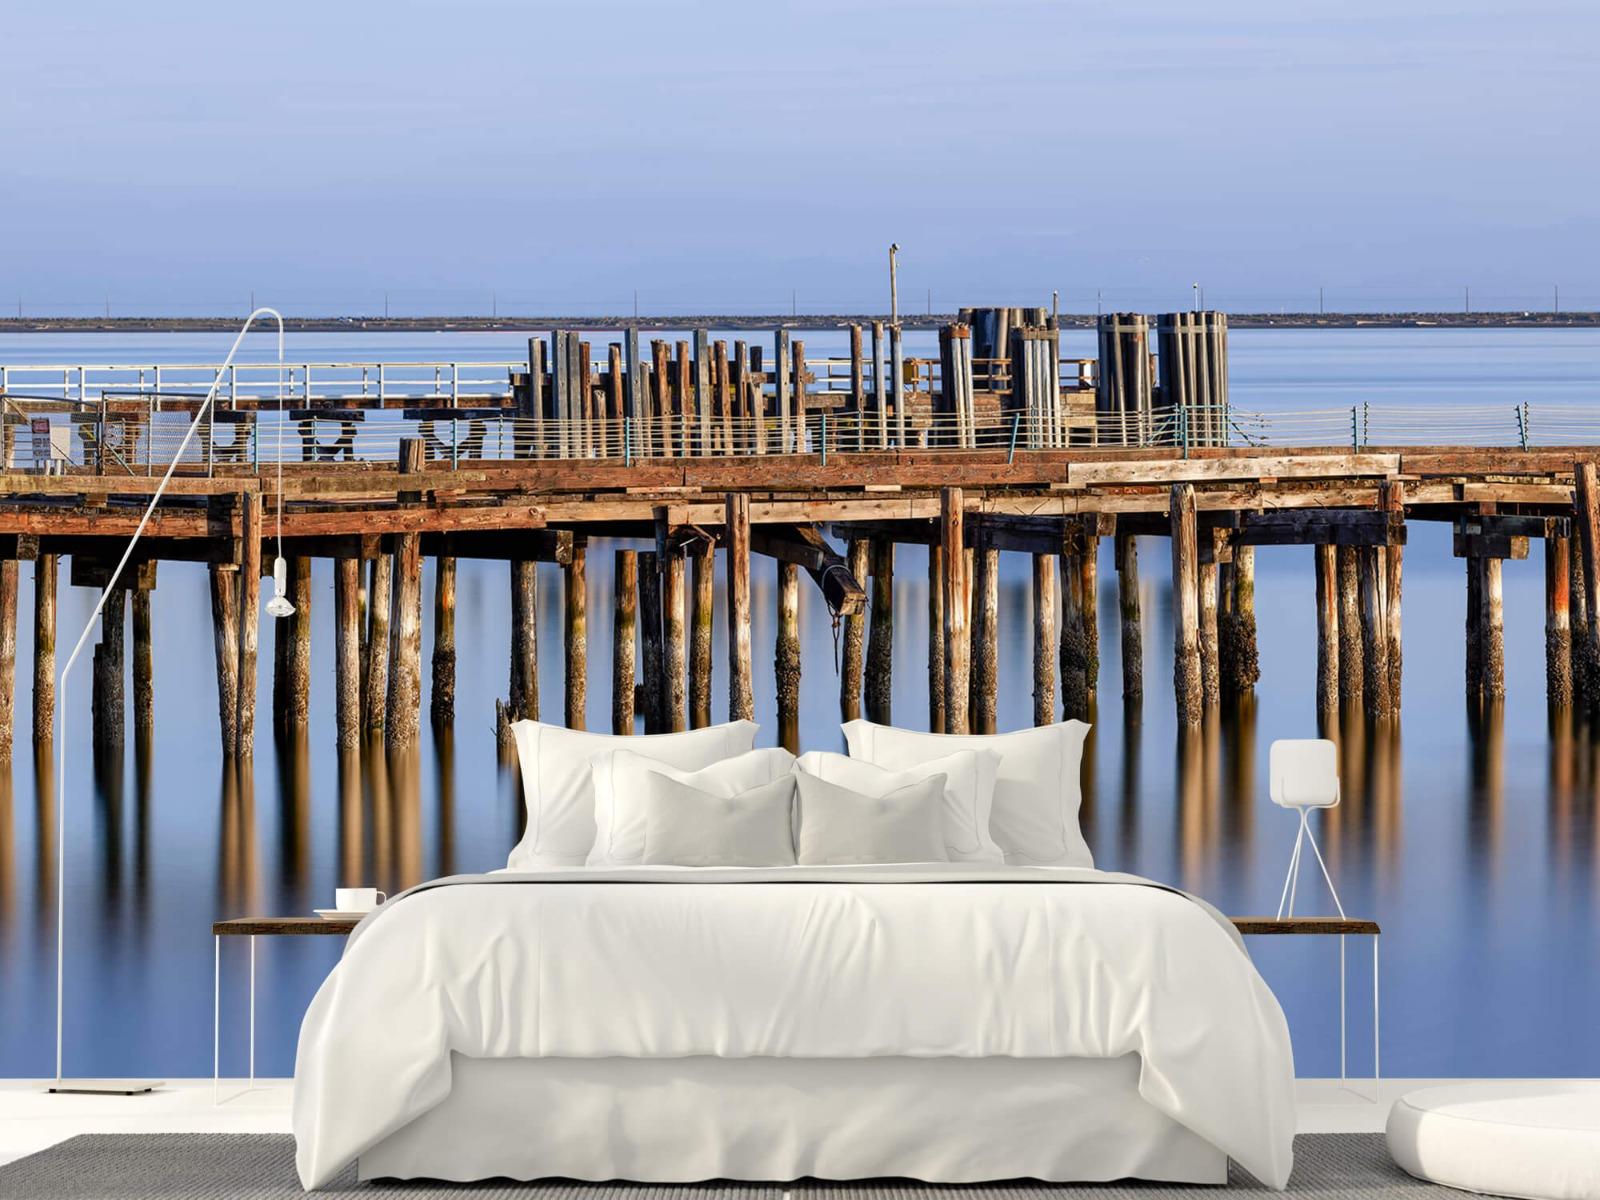 Houten Steigers - Steiger op houten palen - Wallexclusive - Slaapkamer 16